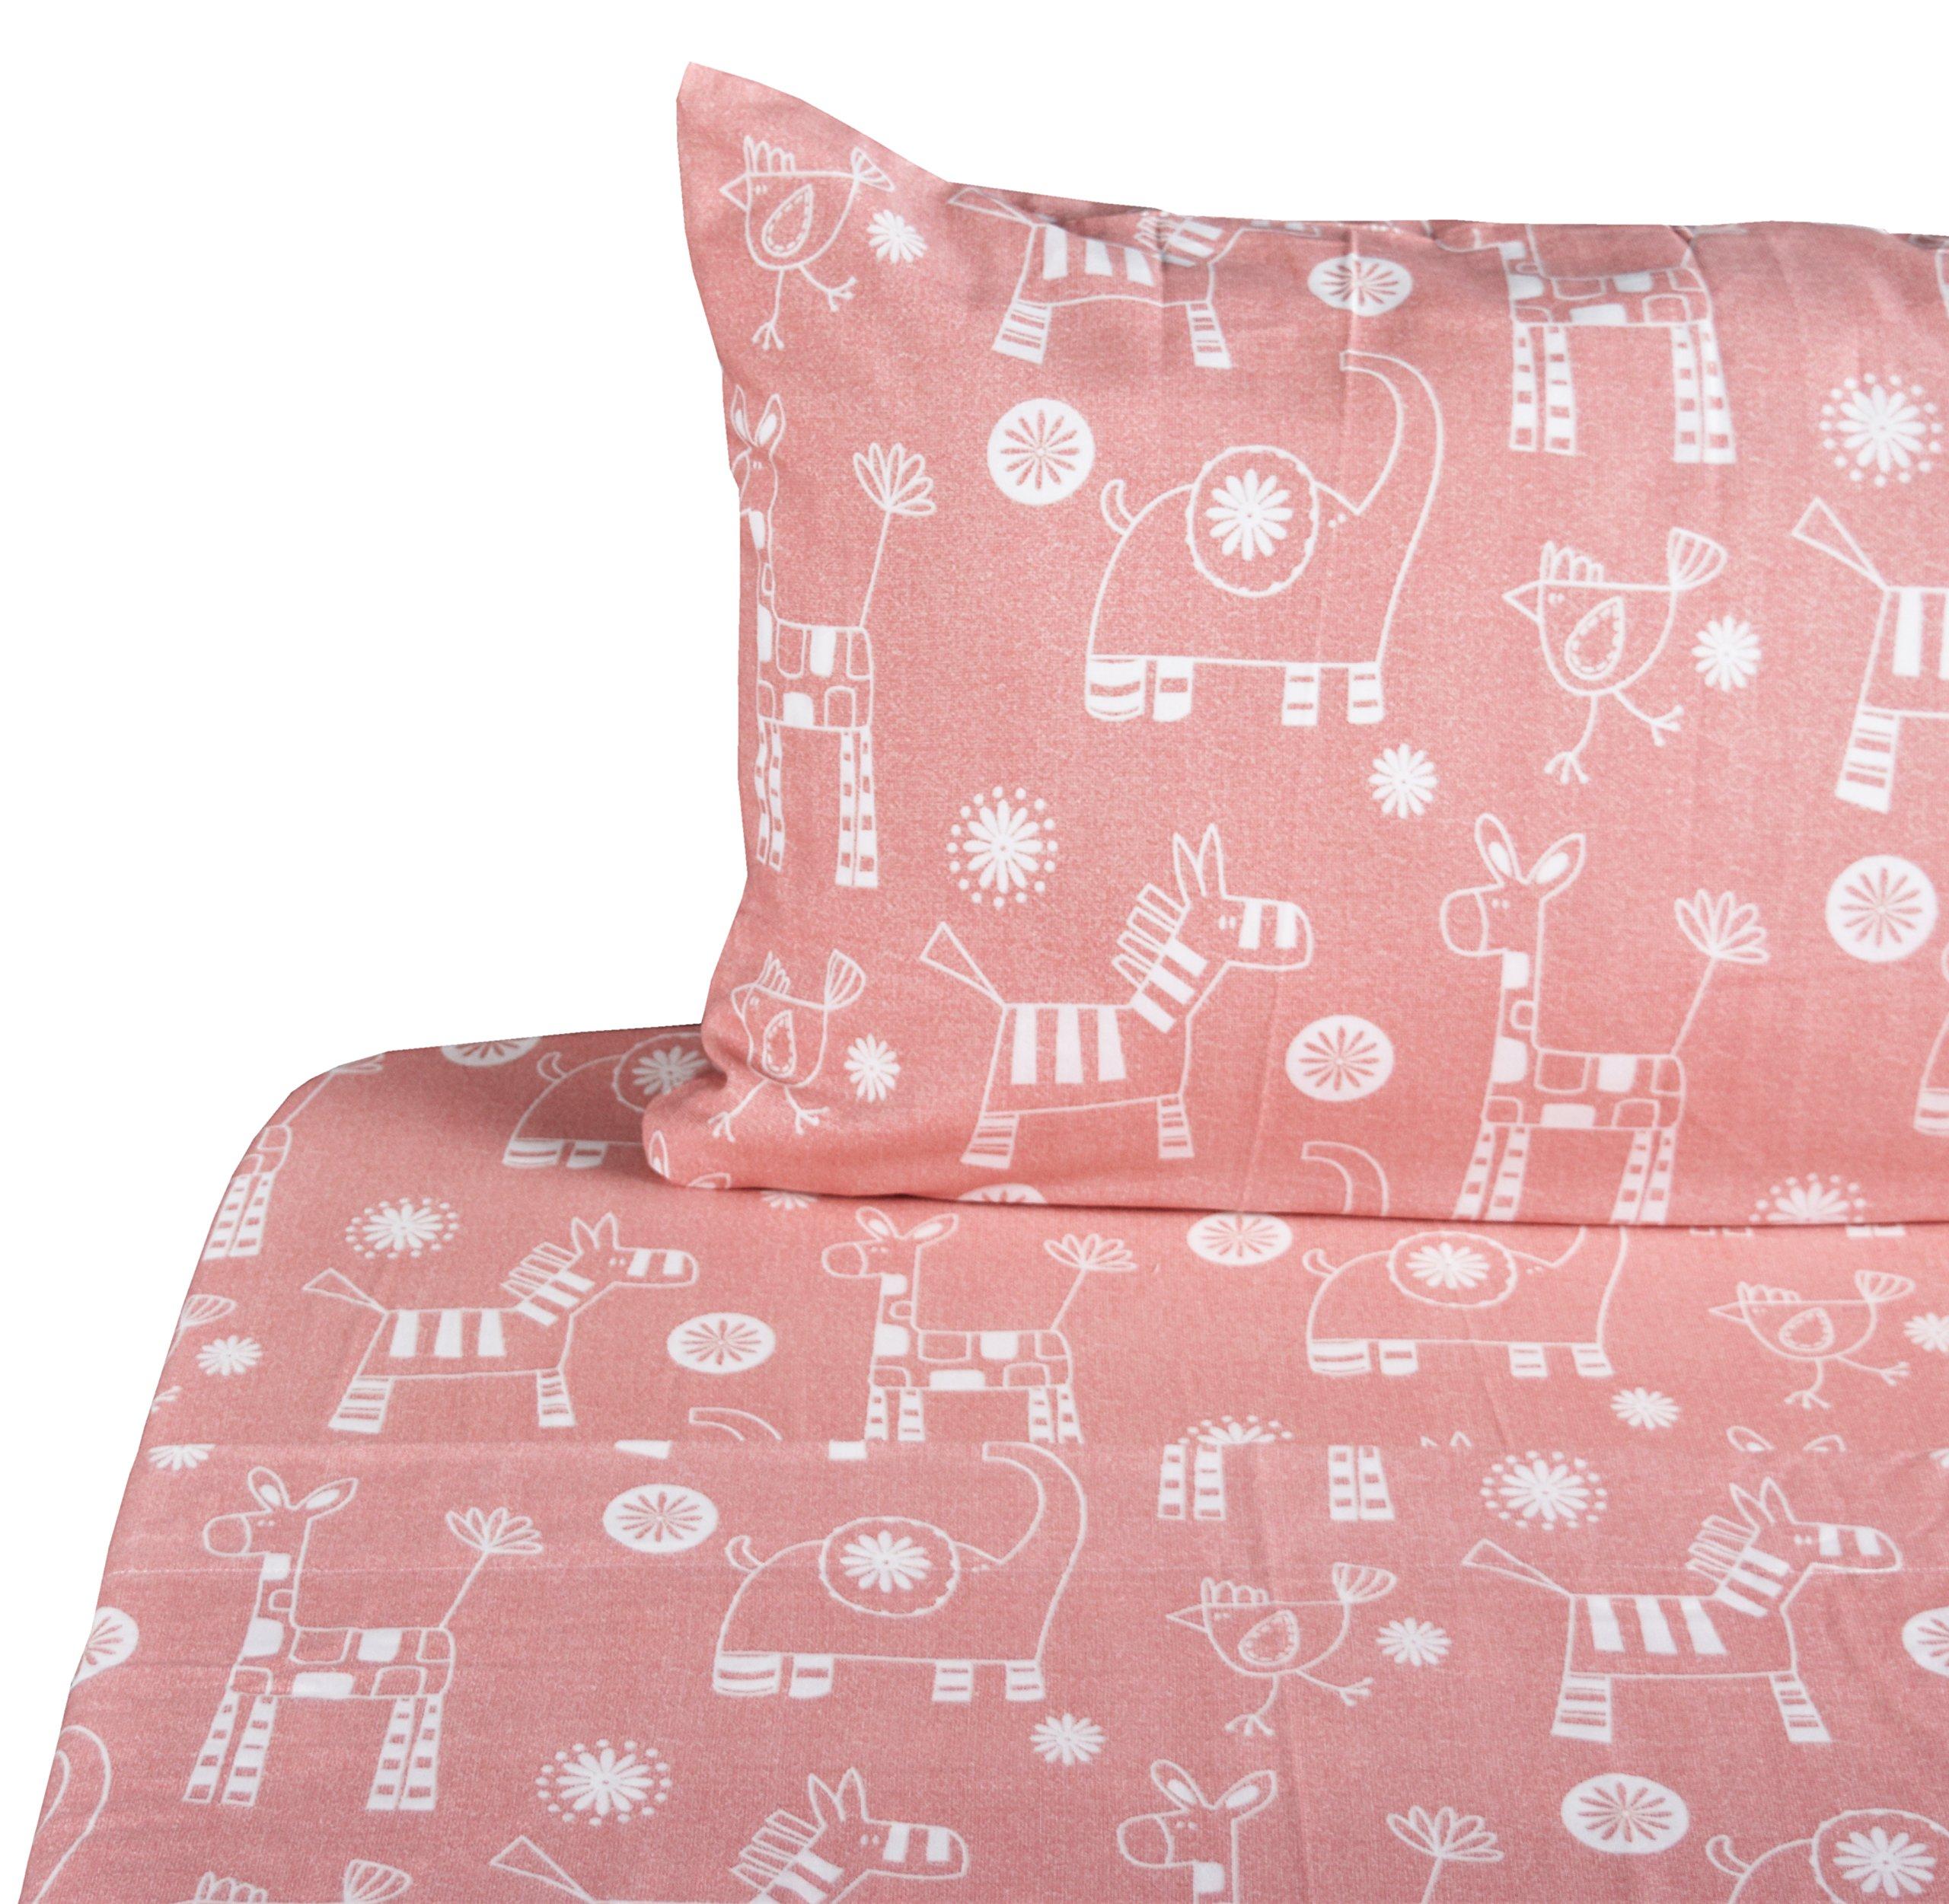 J-pinno Girls Animals Elephant Chicken Zebra Double Layer Muslin Cotton Bed Sheet Set Twin, Flat Sheet & Fitted Sheet & Pillowcase Natural Hypoallergenic Bedding Set (8, Twin)